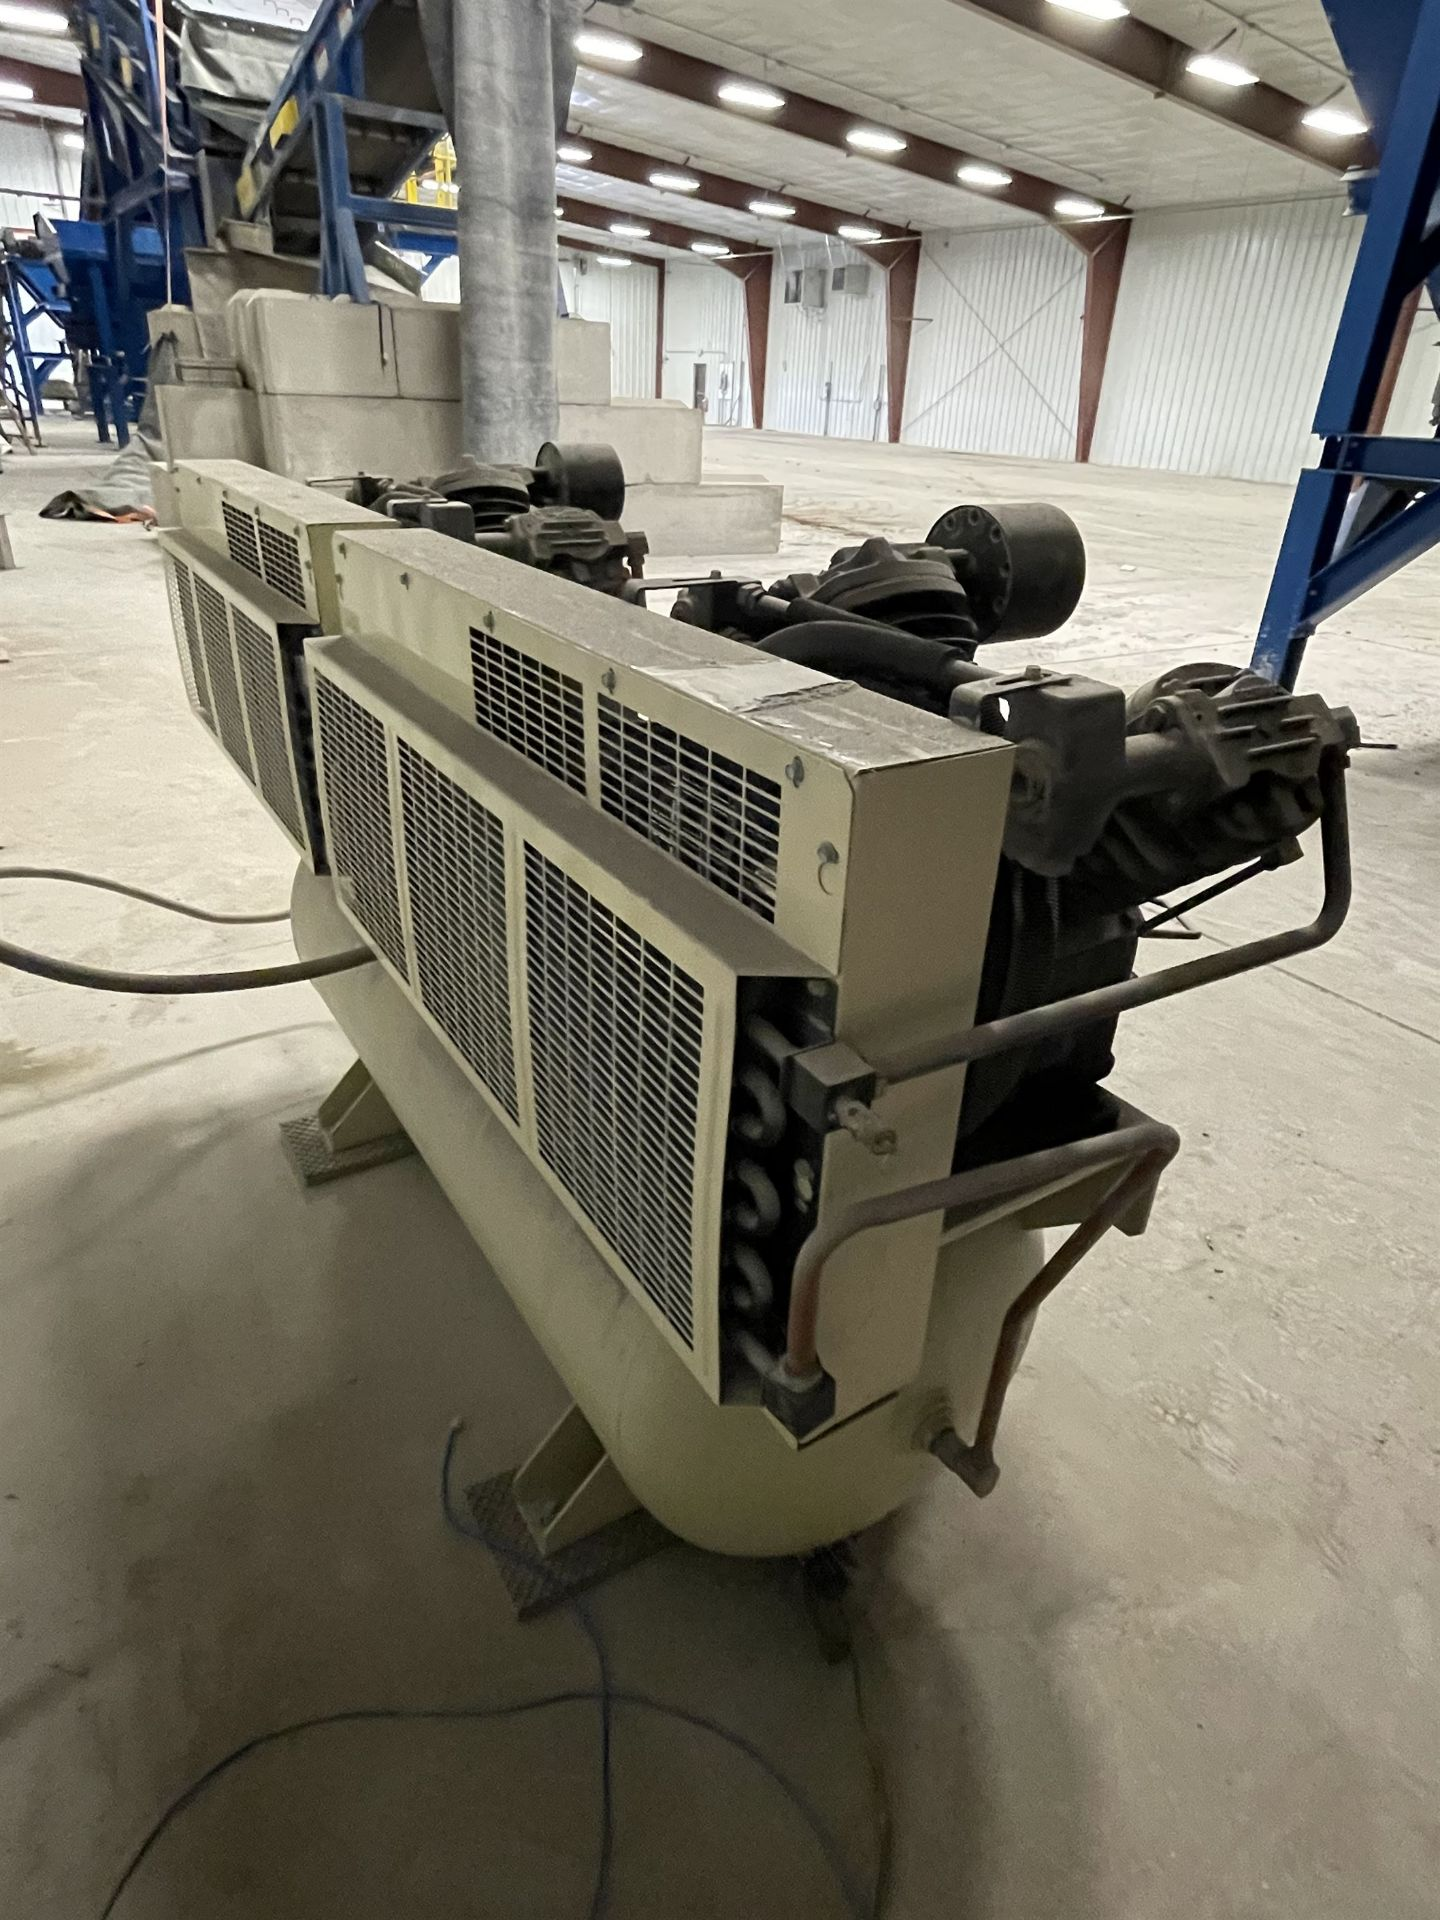 INGERSOLL RAND 2-2545E10-P 20-HP Air Compressor, s/n CBV475831 - Image 4 of 5